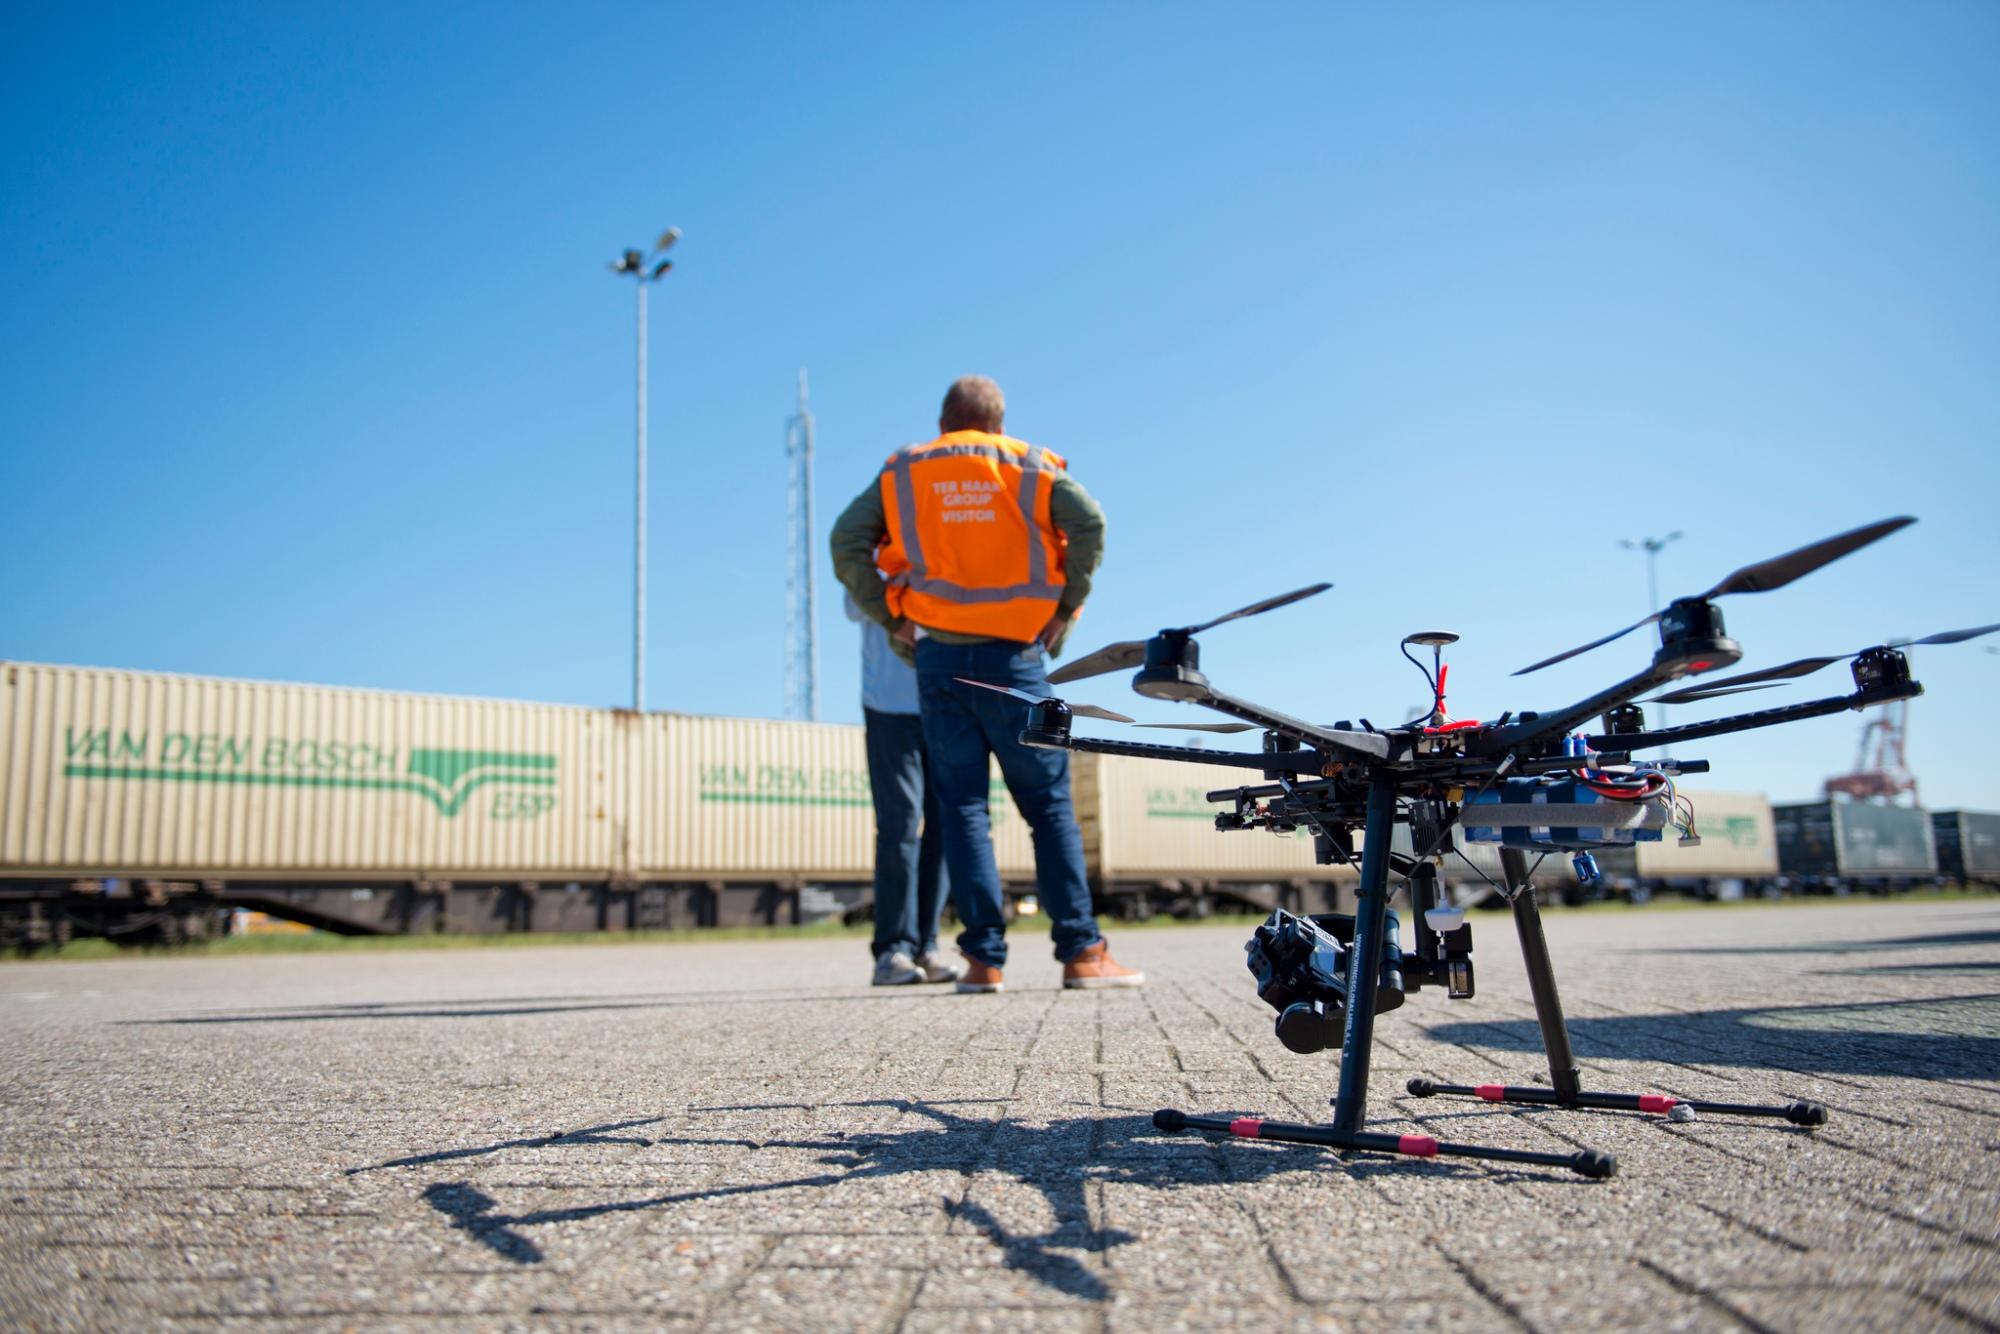 Drohne vor Bauarbeiter